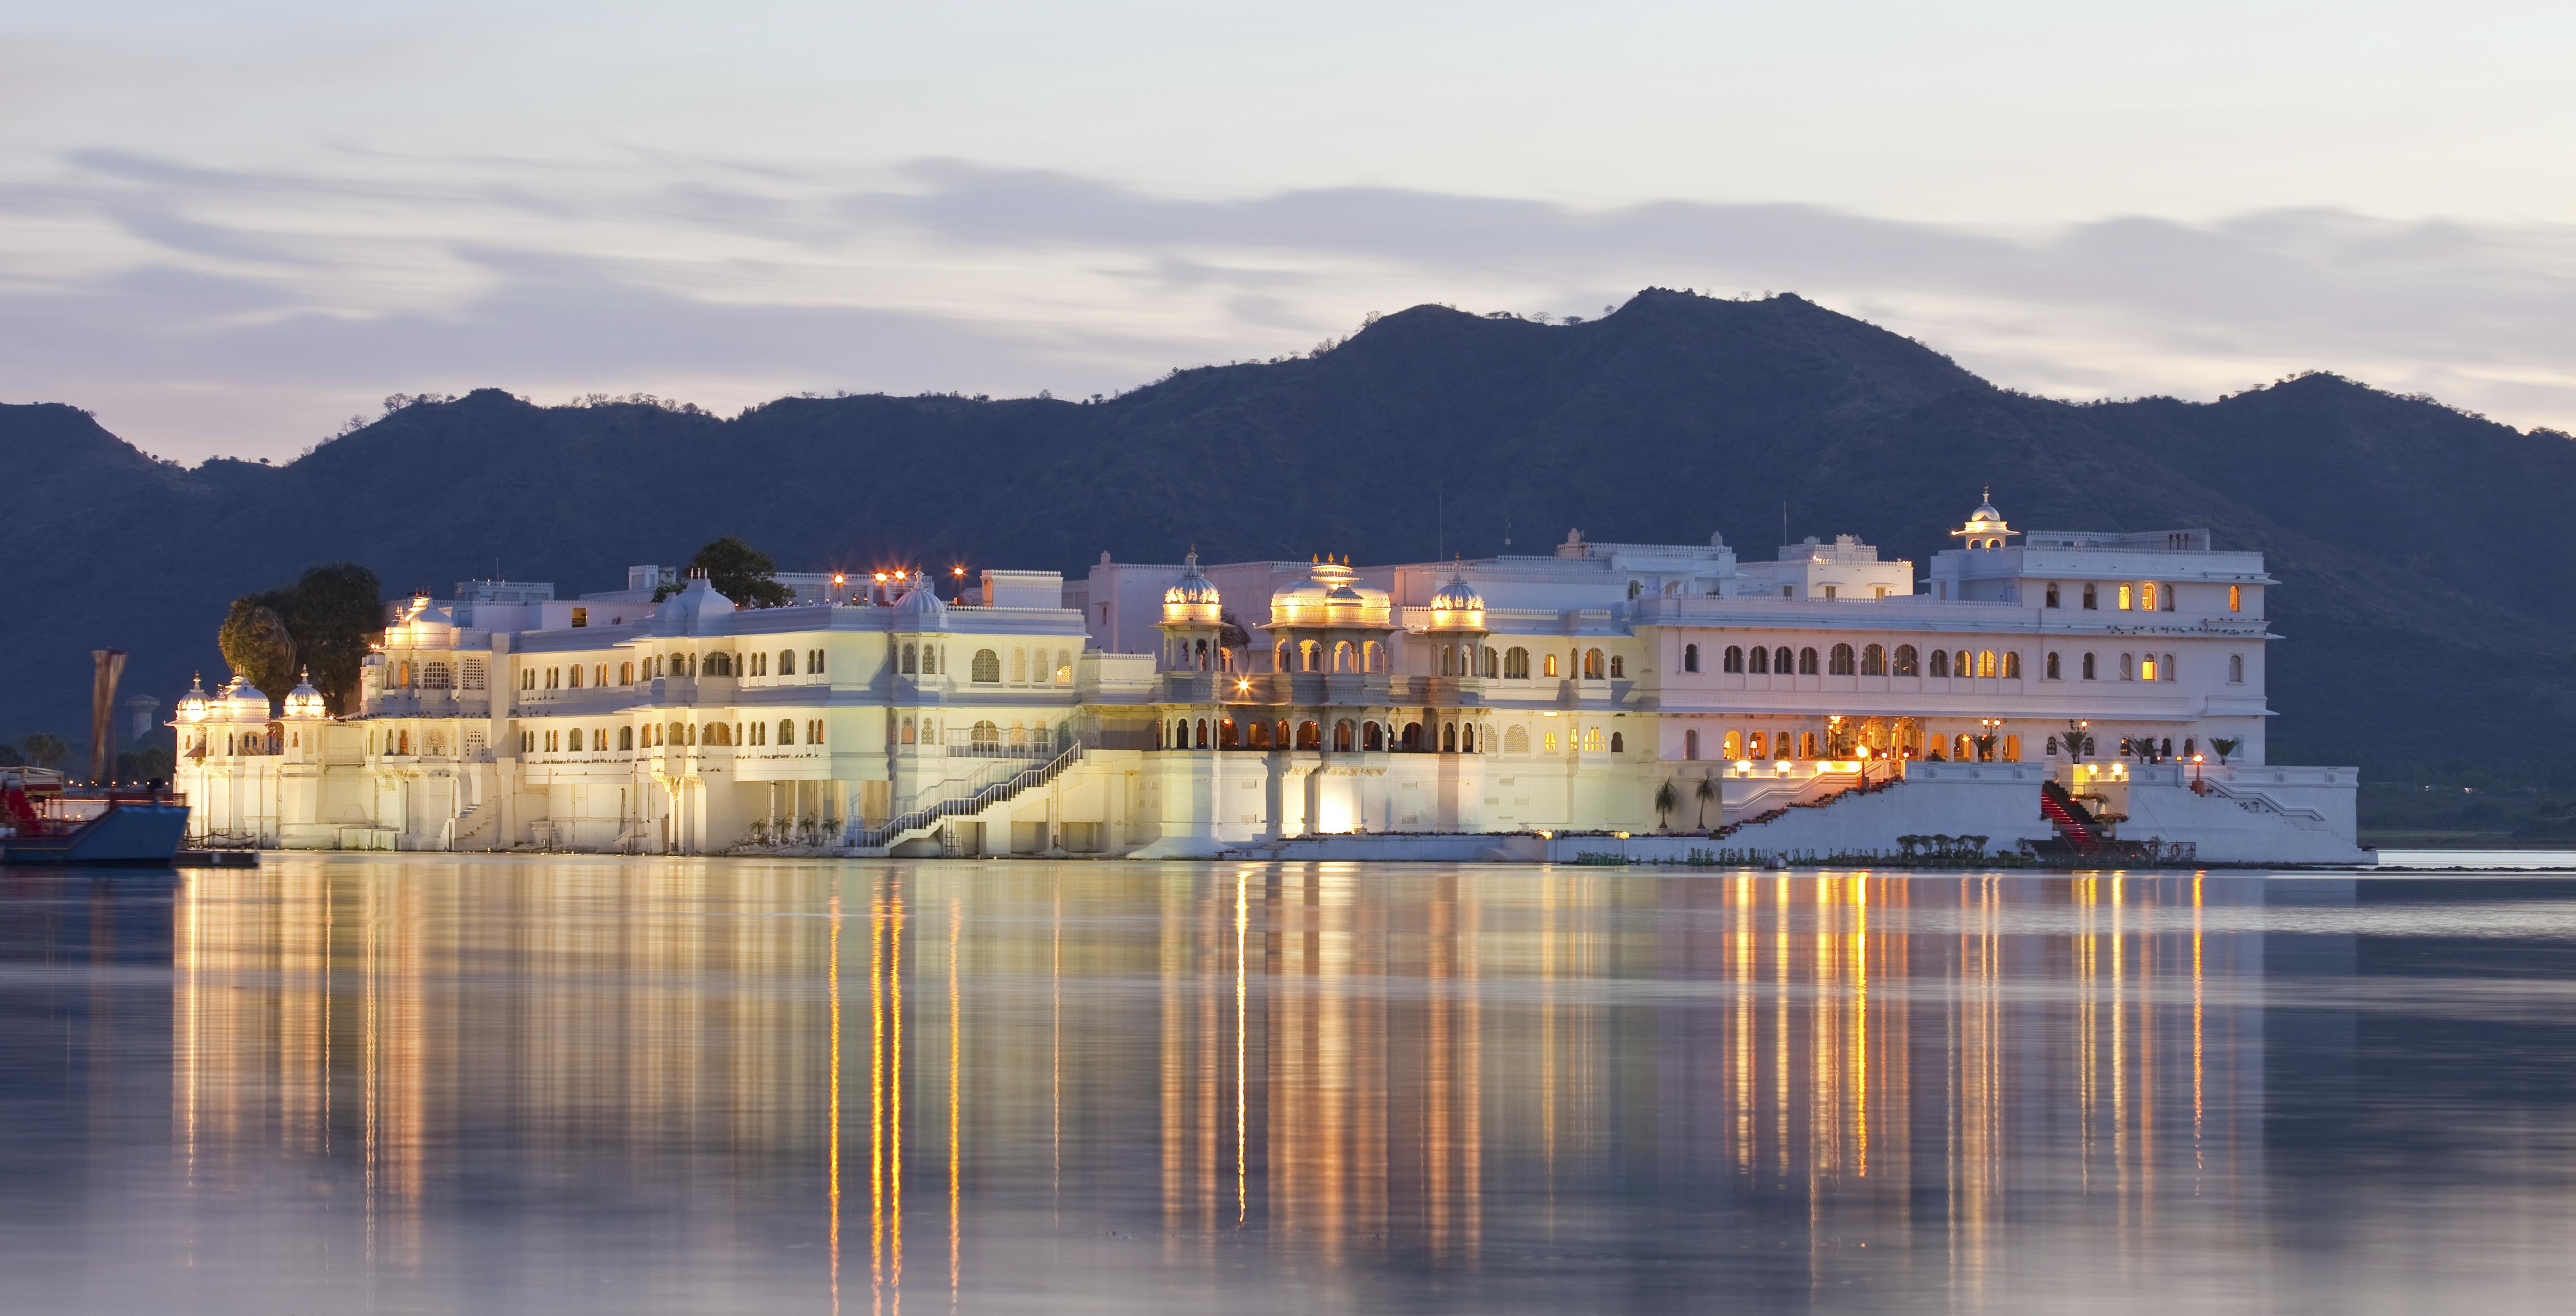 City-of-lakes,Udaipur,India,Asia